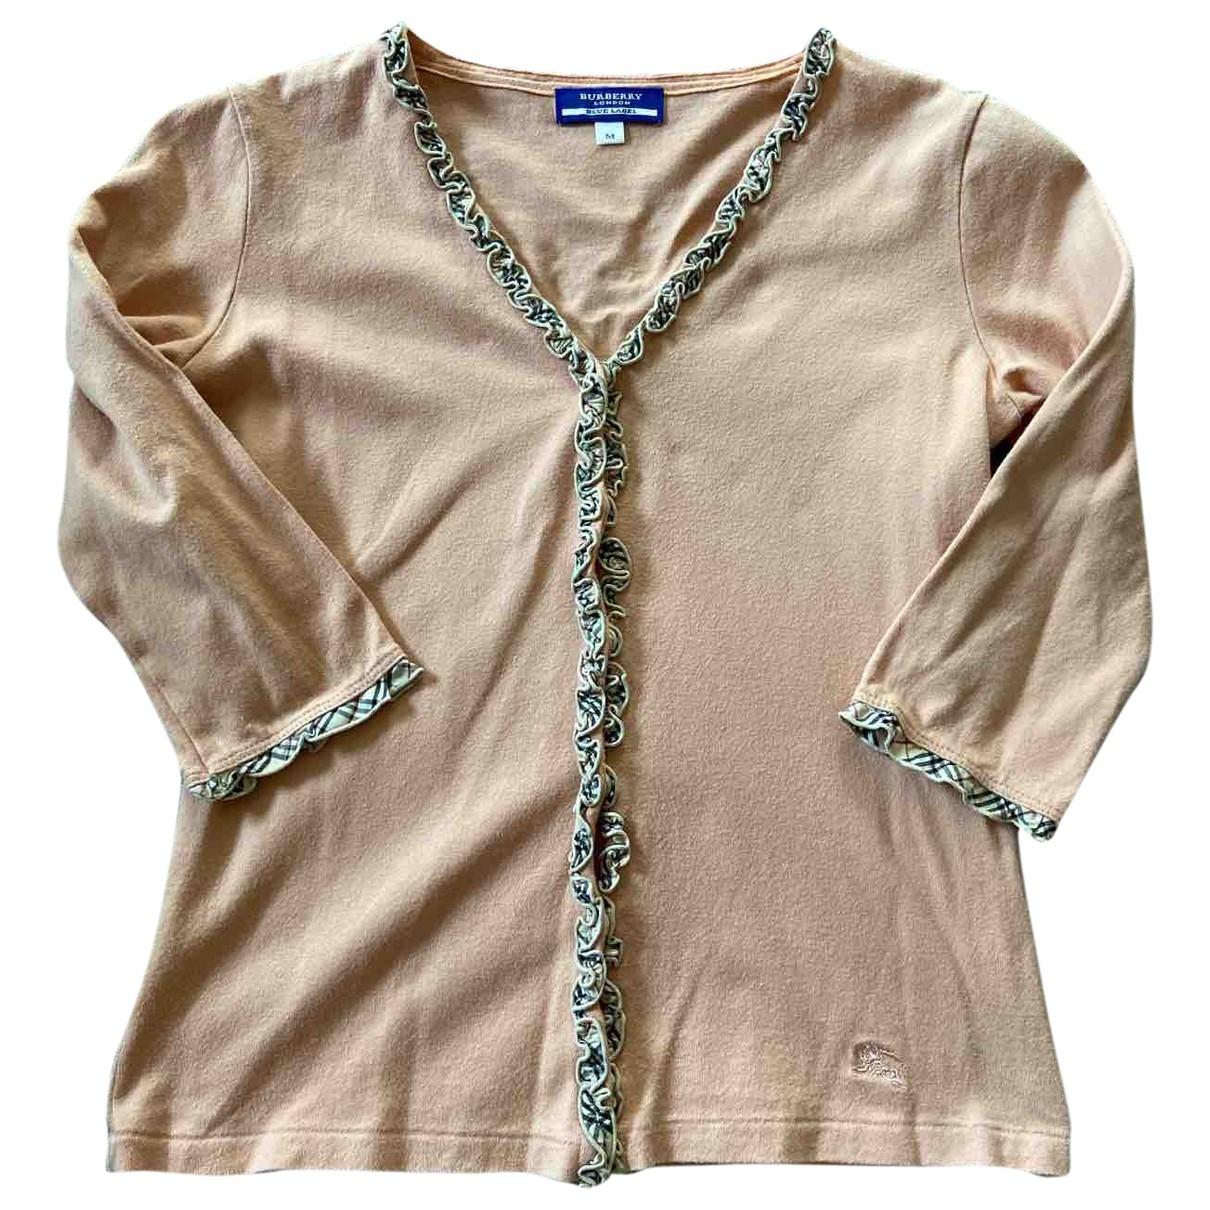 Burberry \N Pink Cotton Knitwear for Women M International